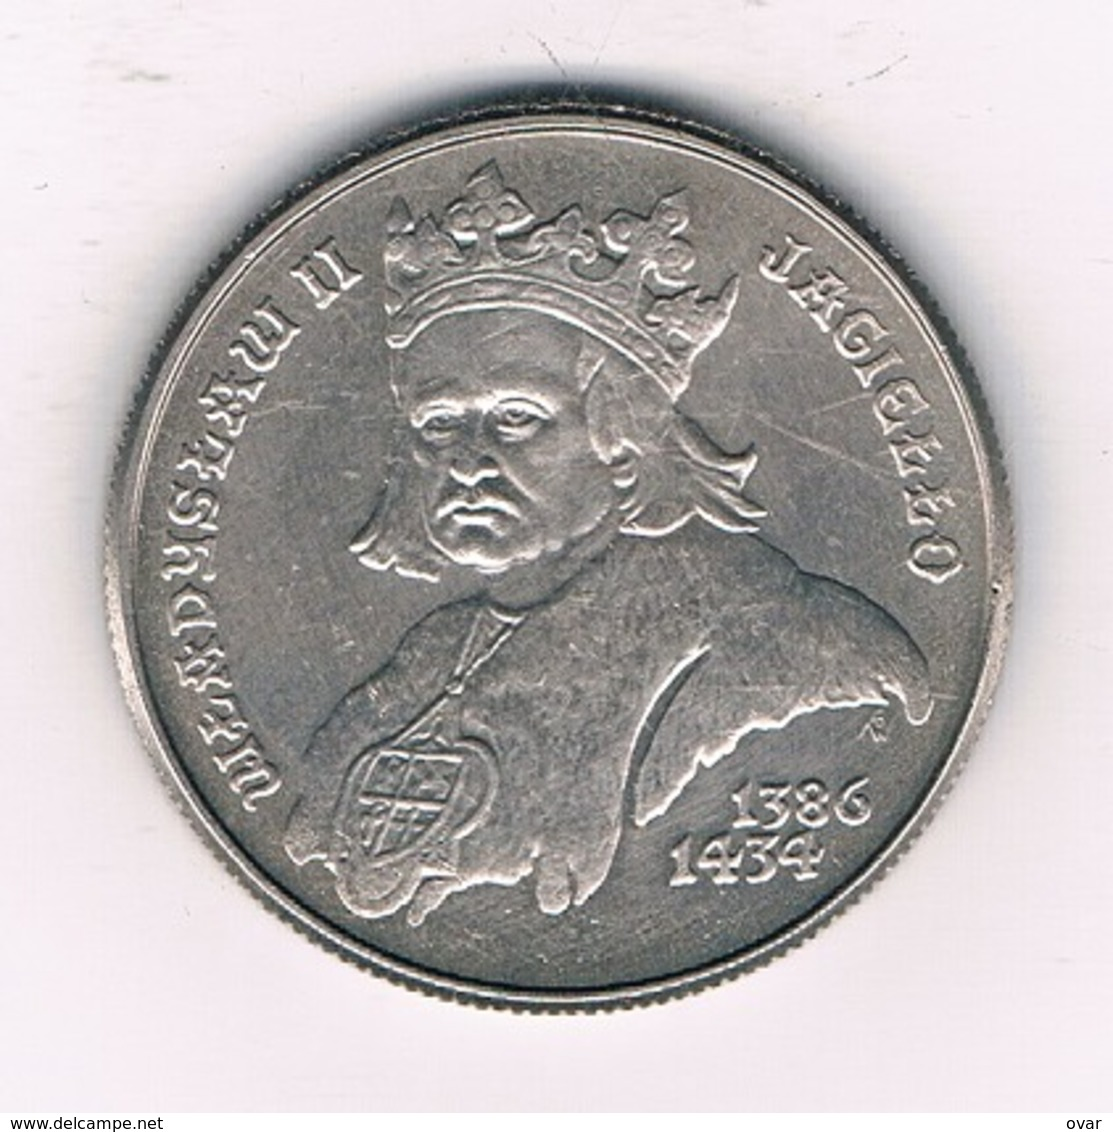 500 ZLOTYCH 1989 POLEN /8783/ - Poland